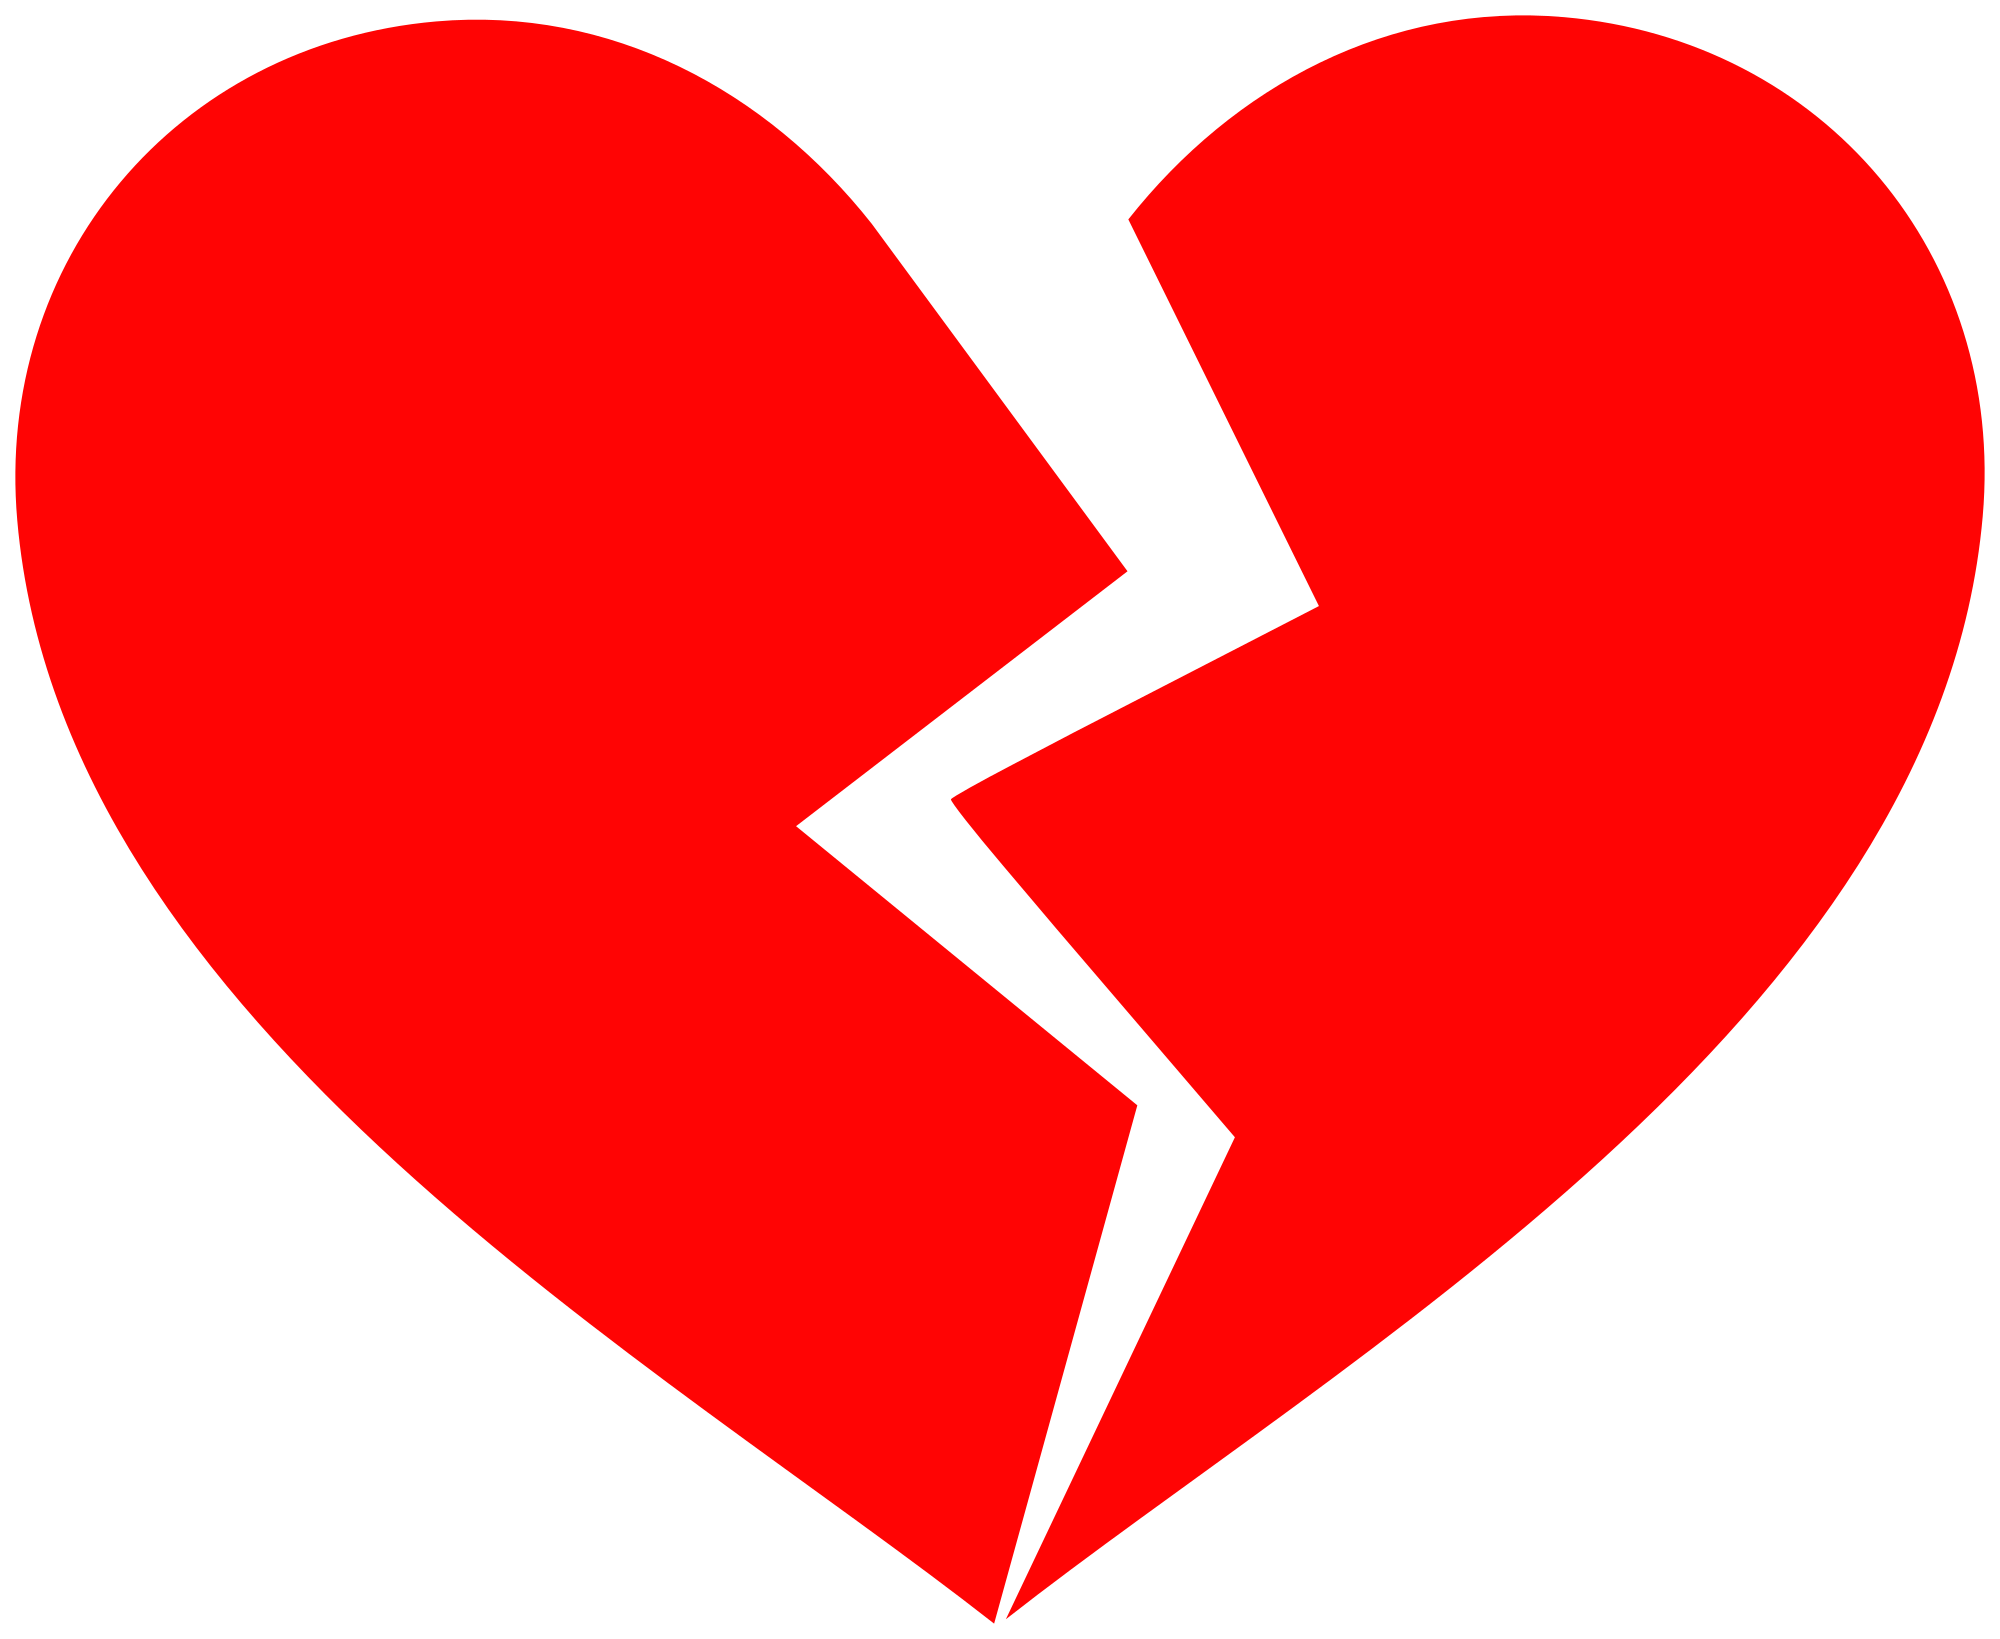 Heart icon clipart vector File:Broken heart.svg - Wikimedia Commons vector